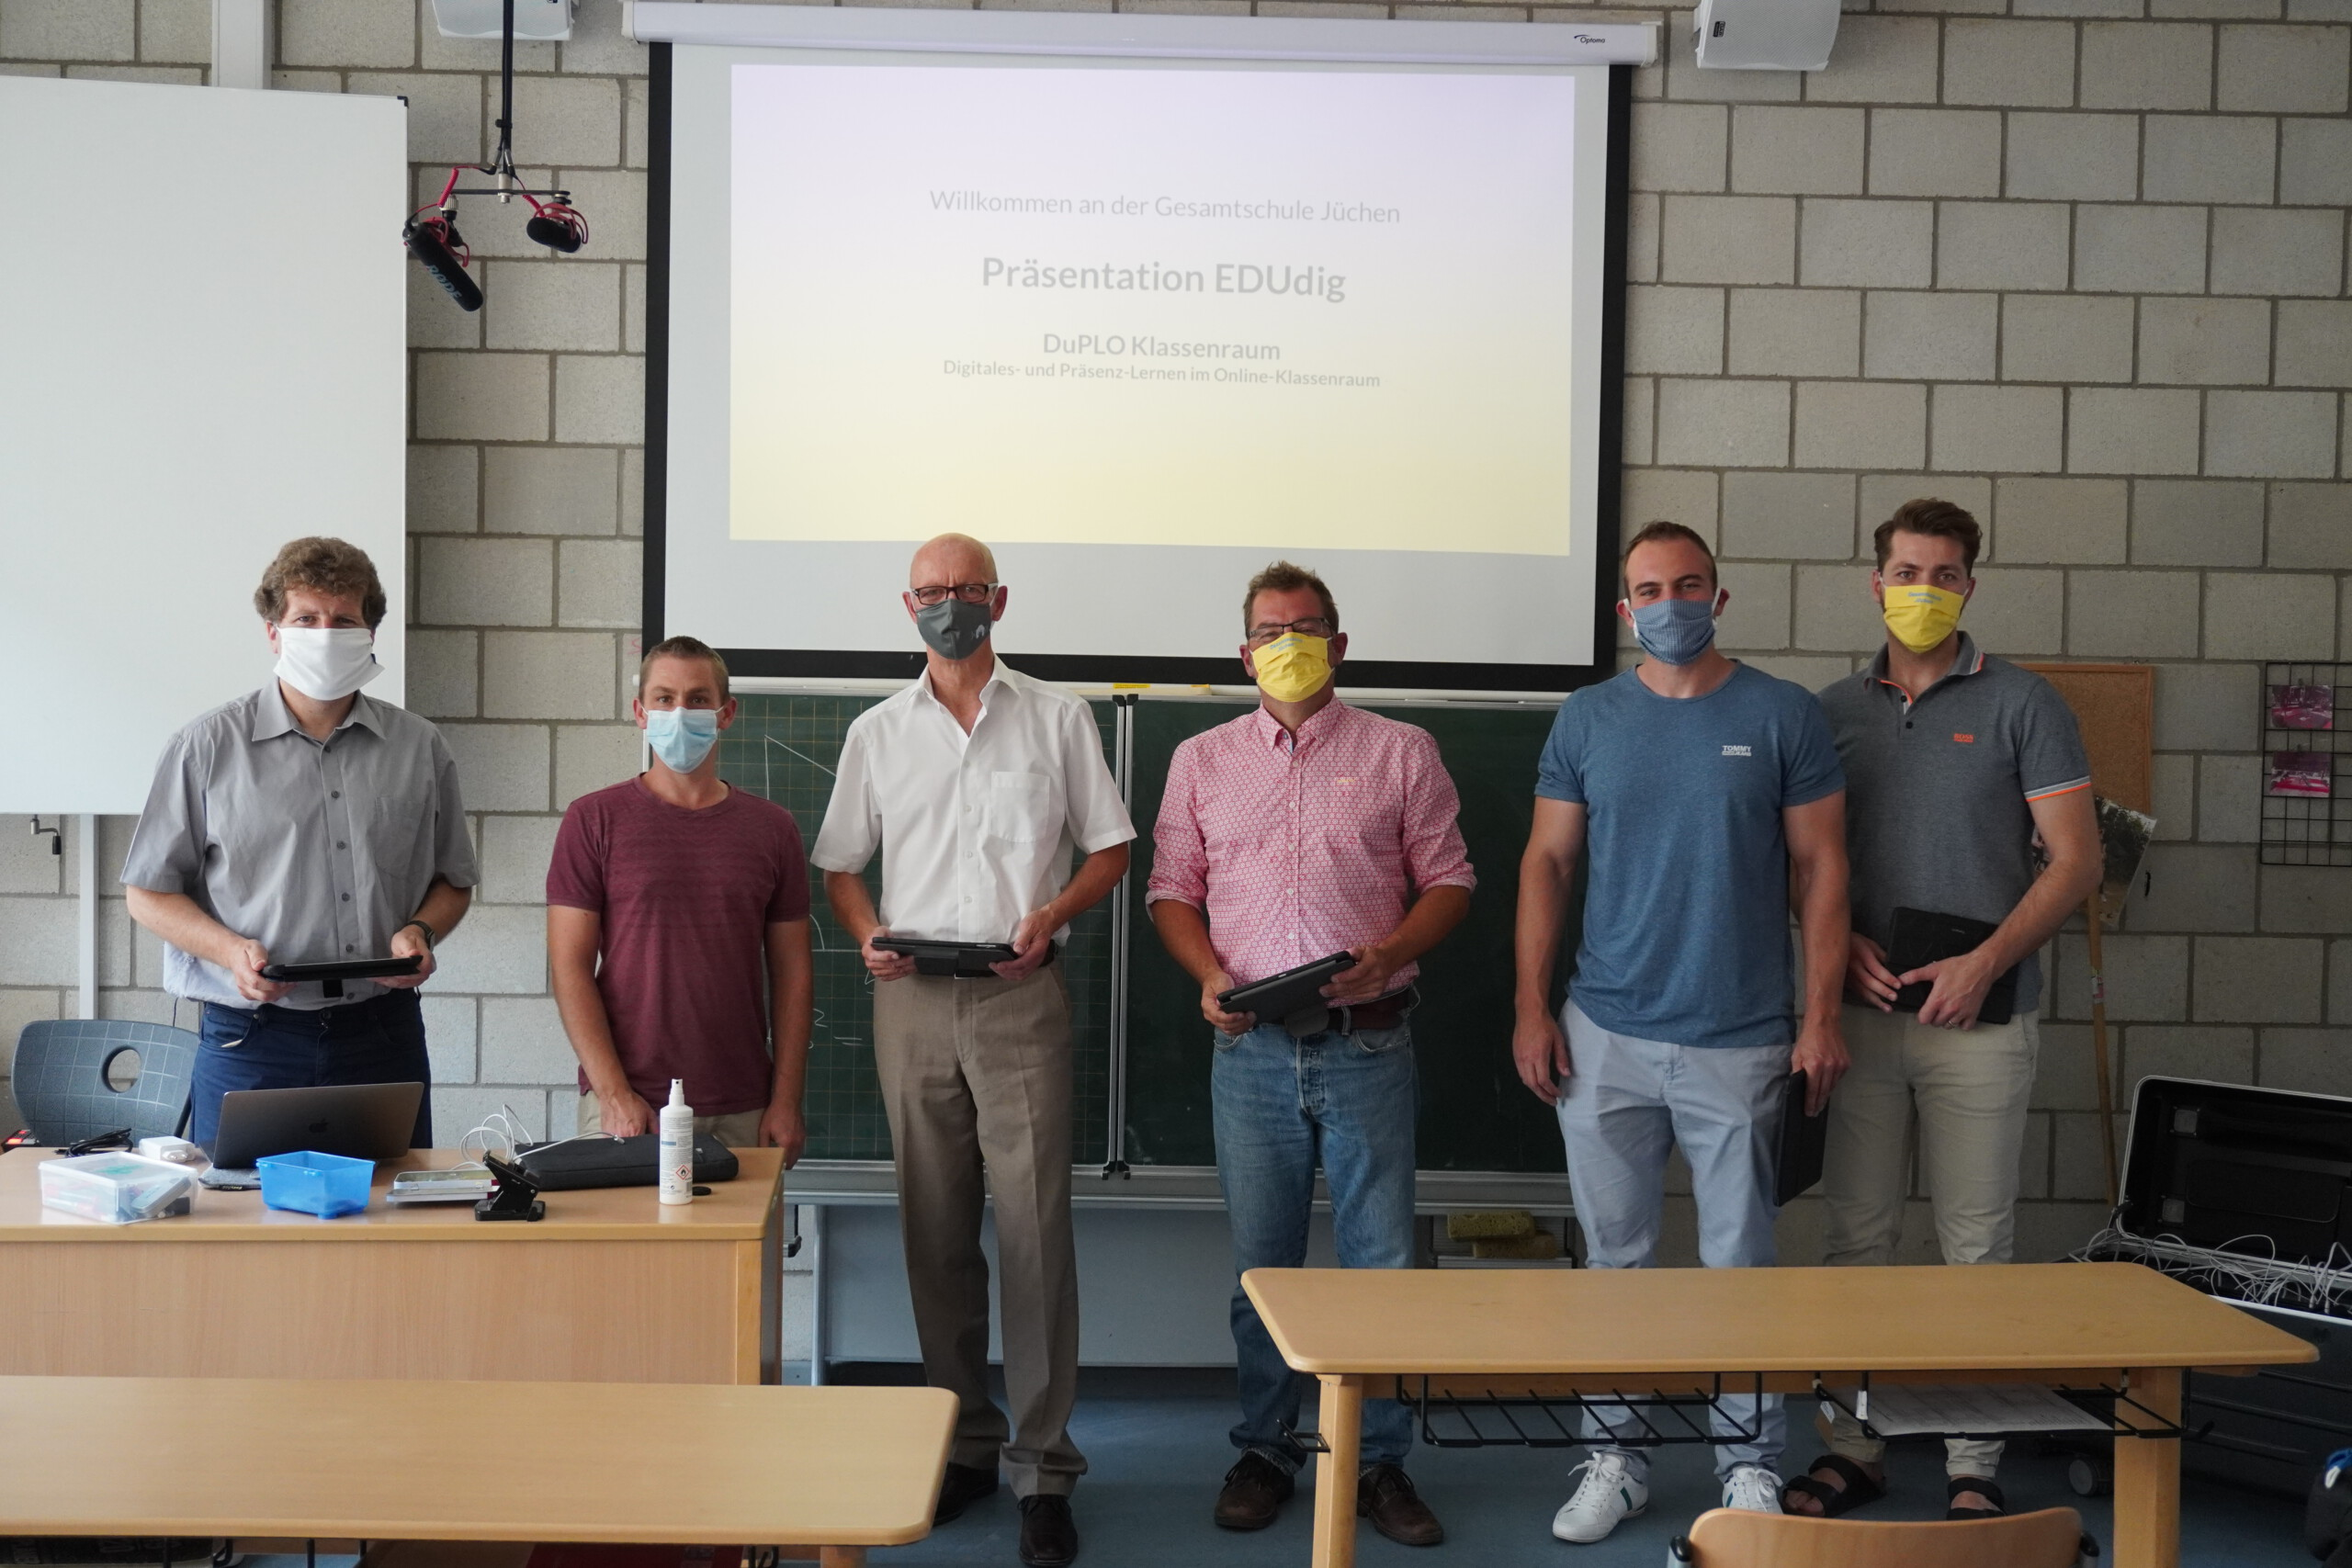 Gesamtschule Jüchen präsentiert DuPLO-Klassenraum